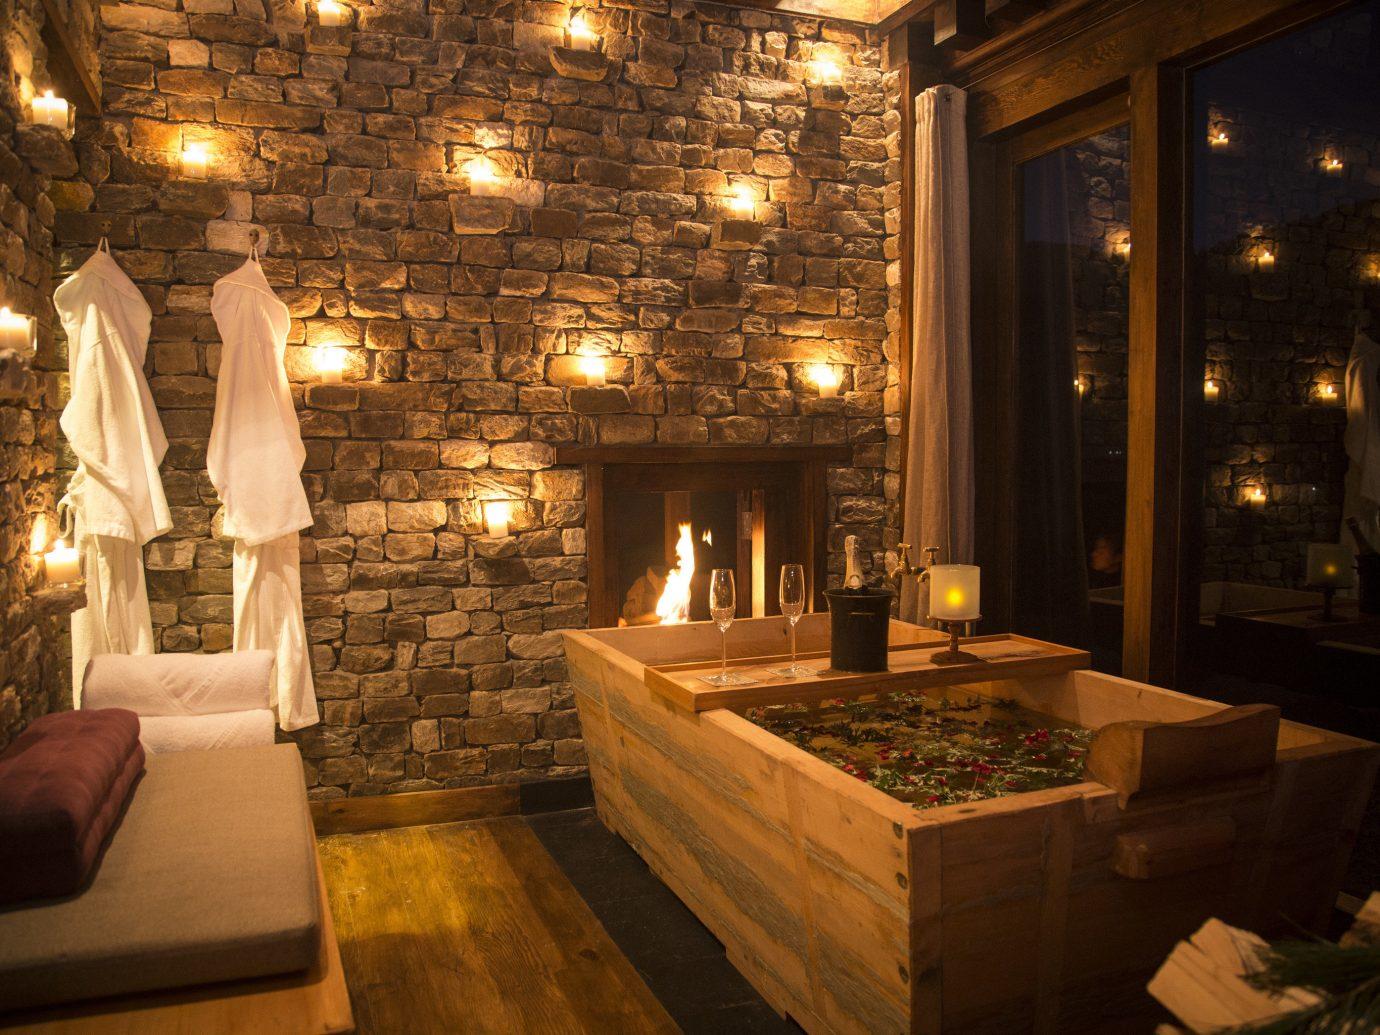 Hotels Offbeat indoor room interior design lighting home ceiling living room window Lobby